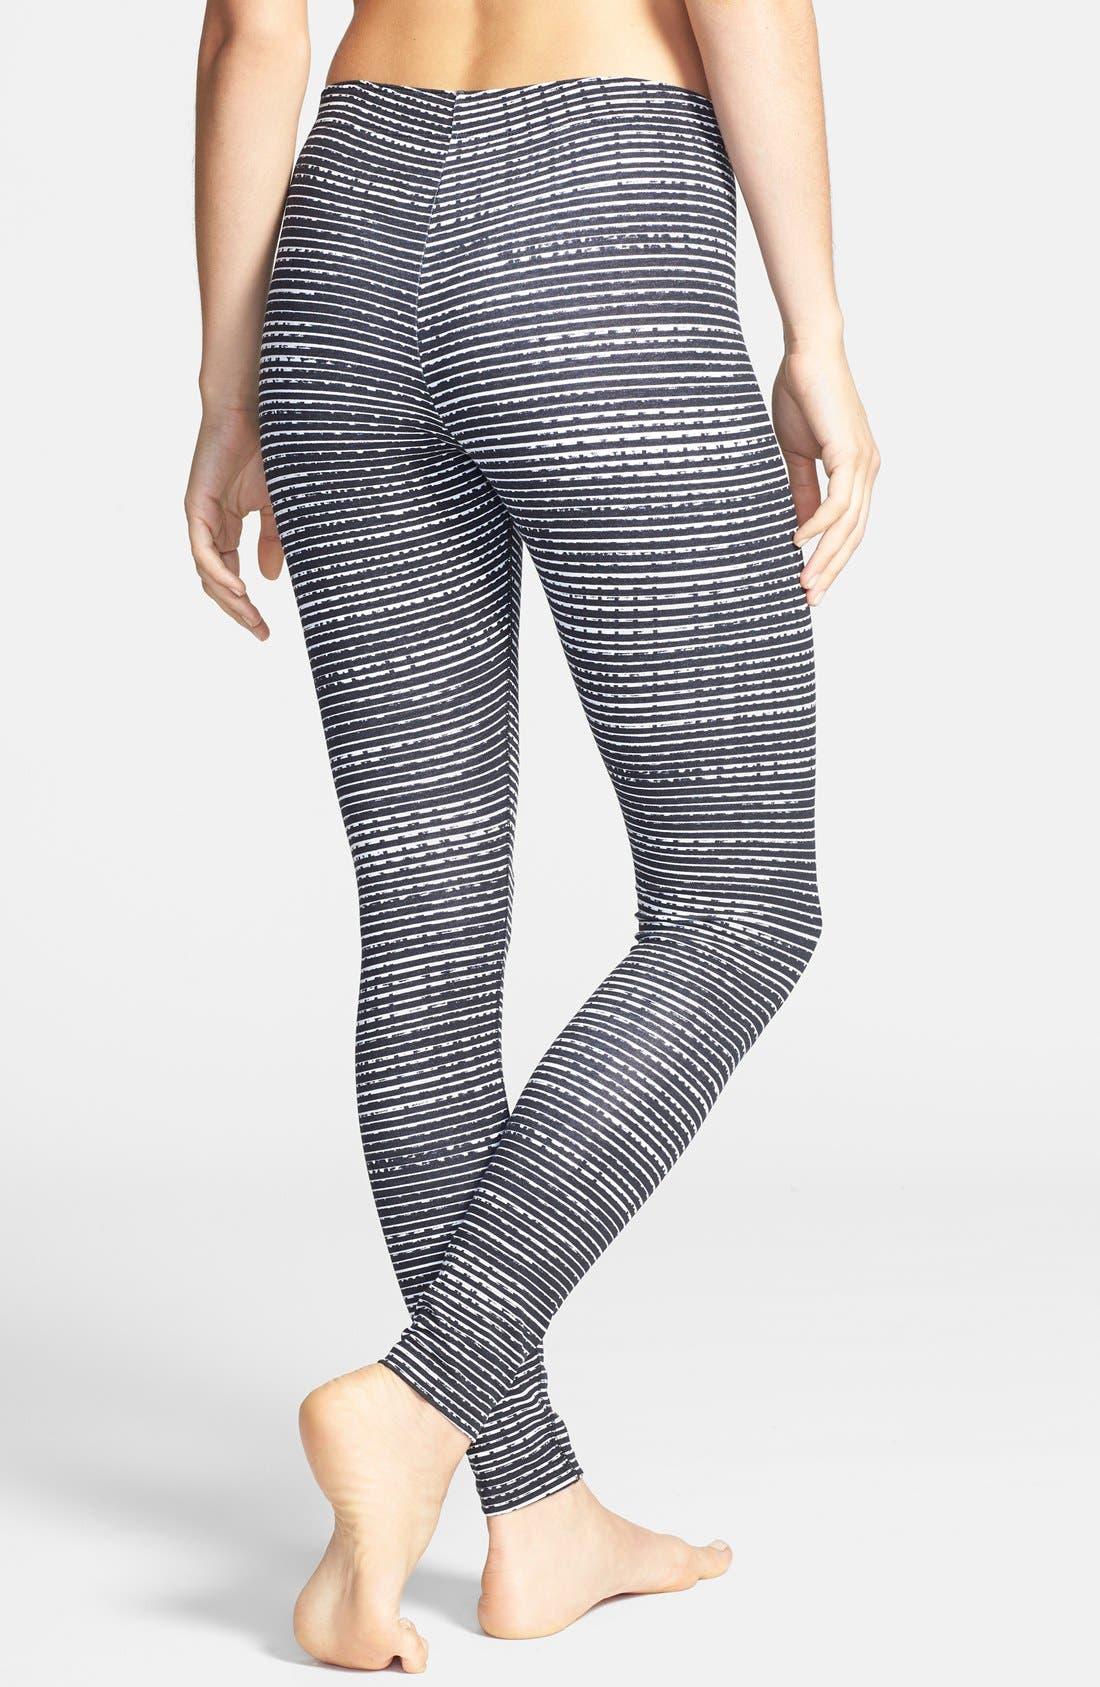 Alternate Image 2  - Nike Leg-A-See AOP Tights